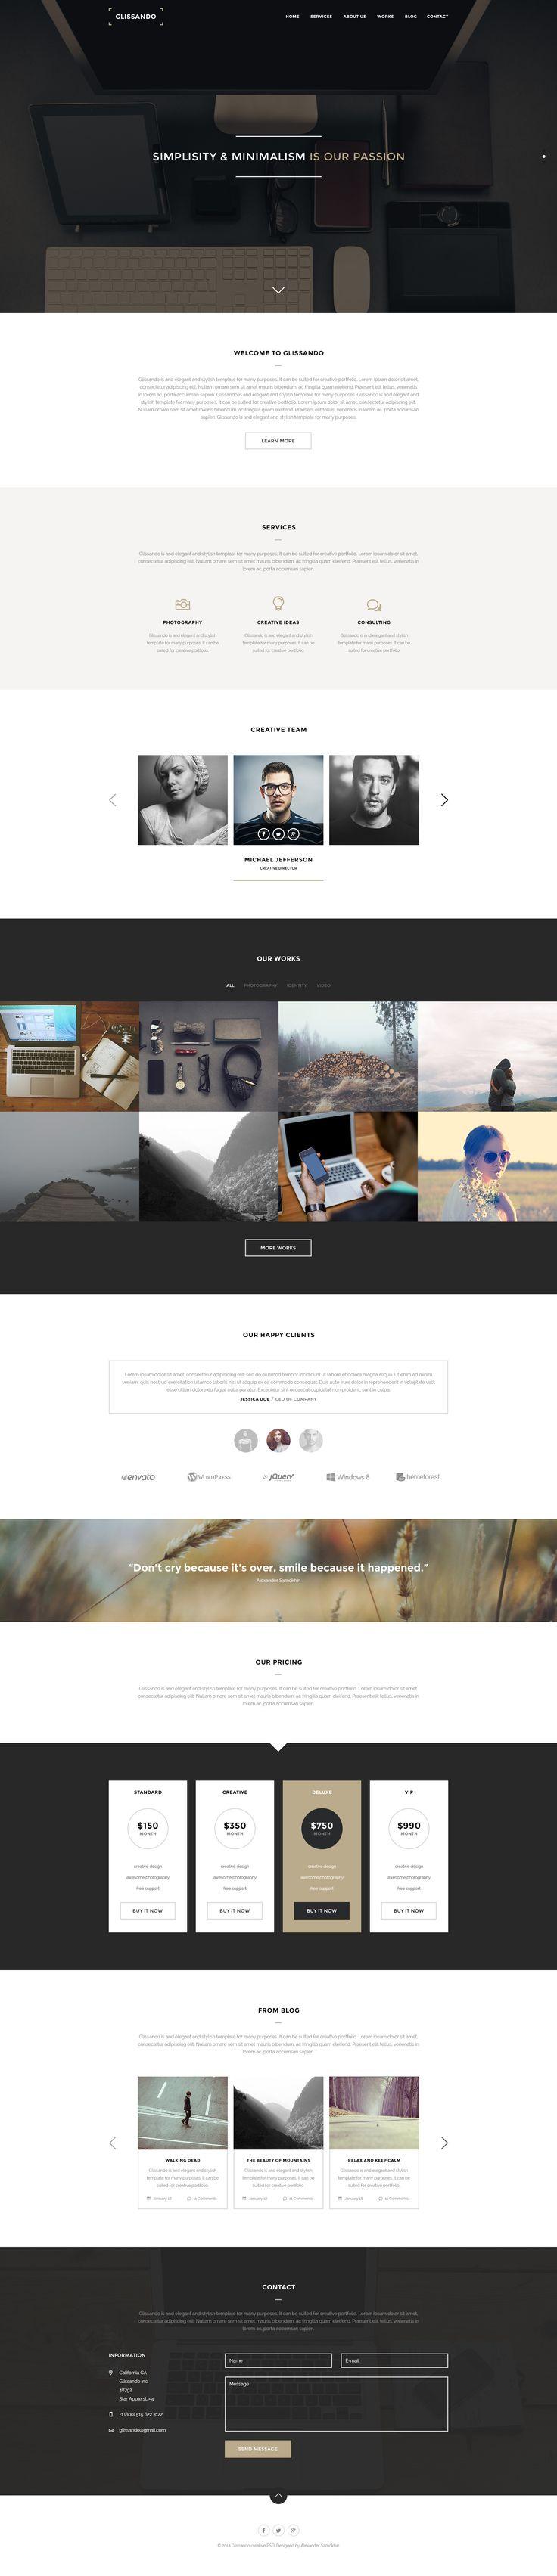 Glissando – Creative Minimal Onepage PSD Template